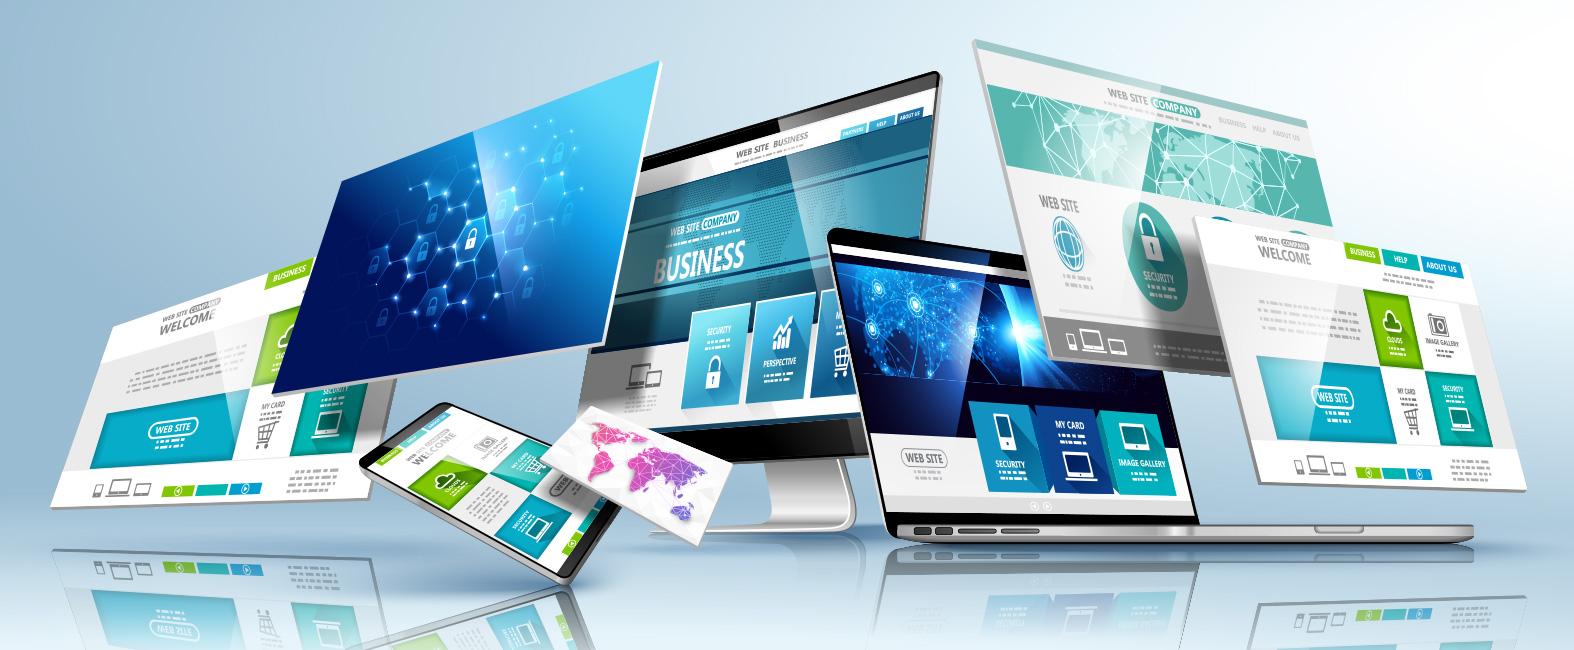 web-design-services-uk